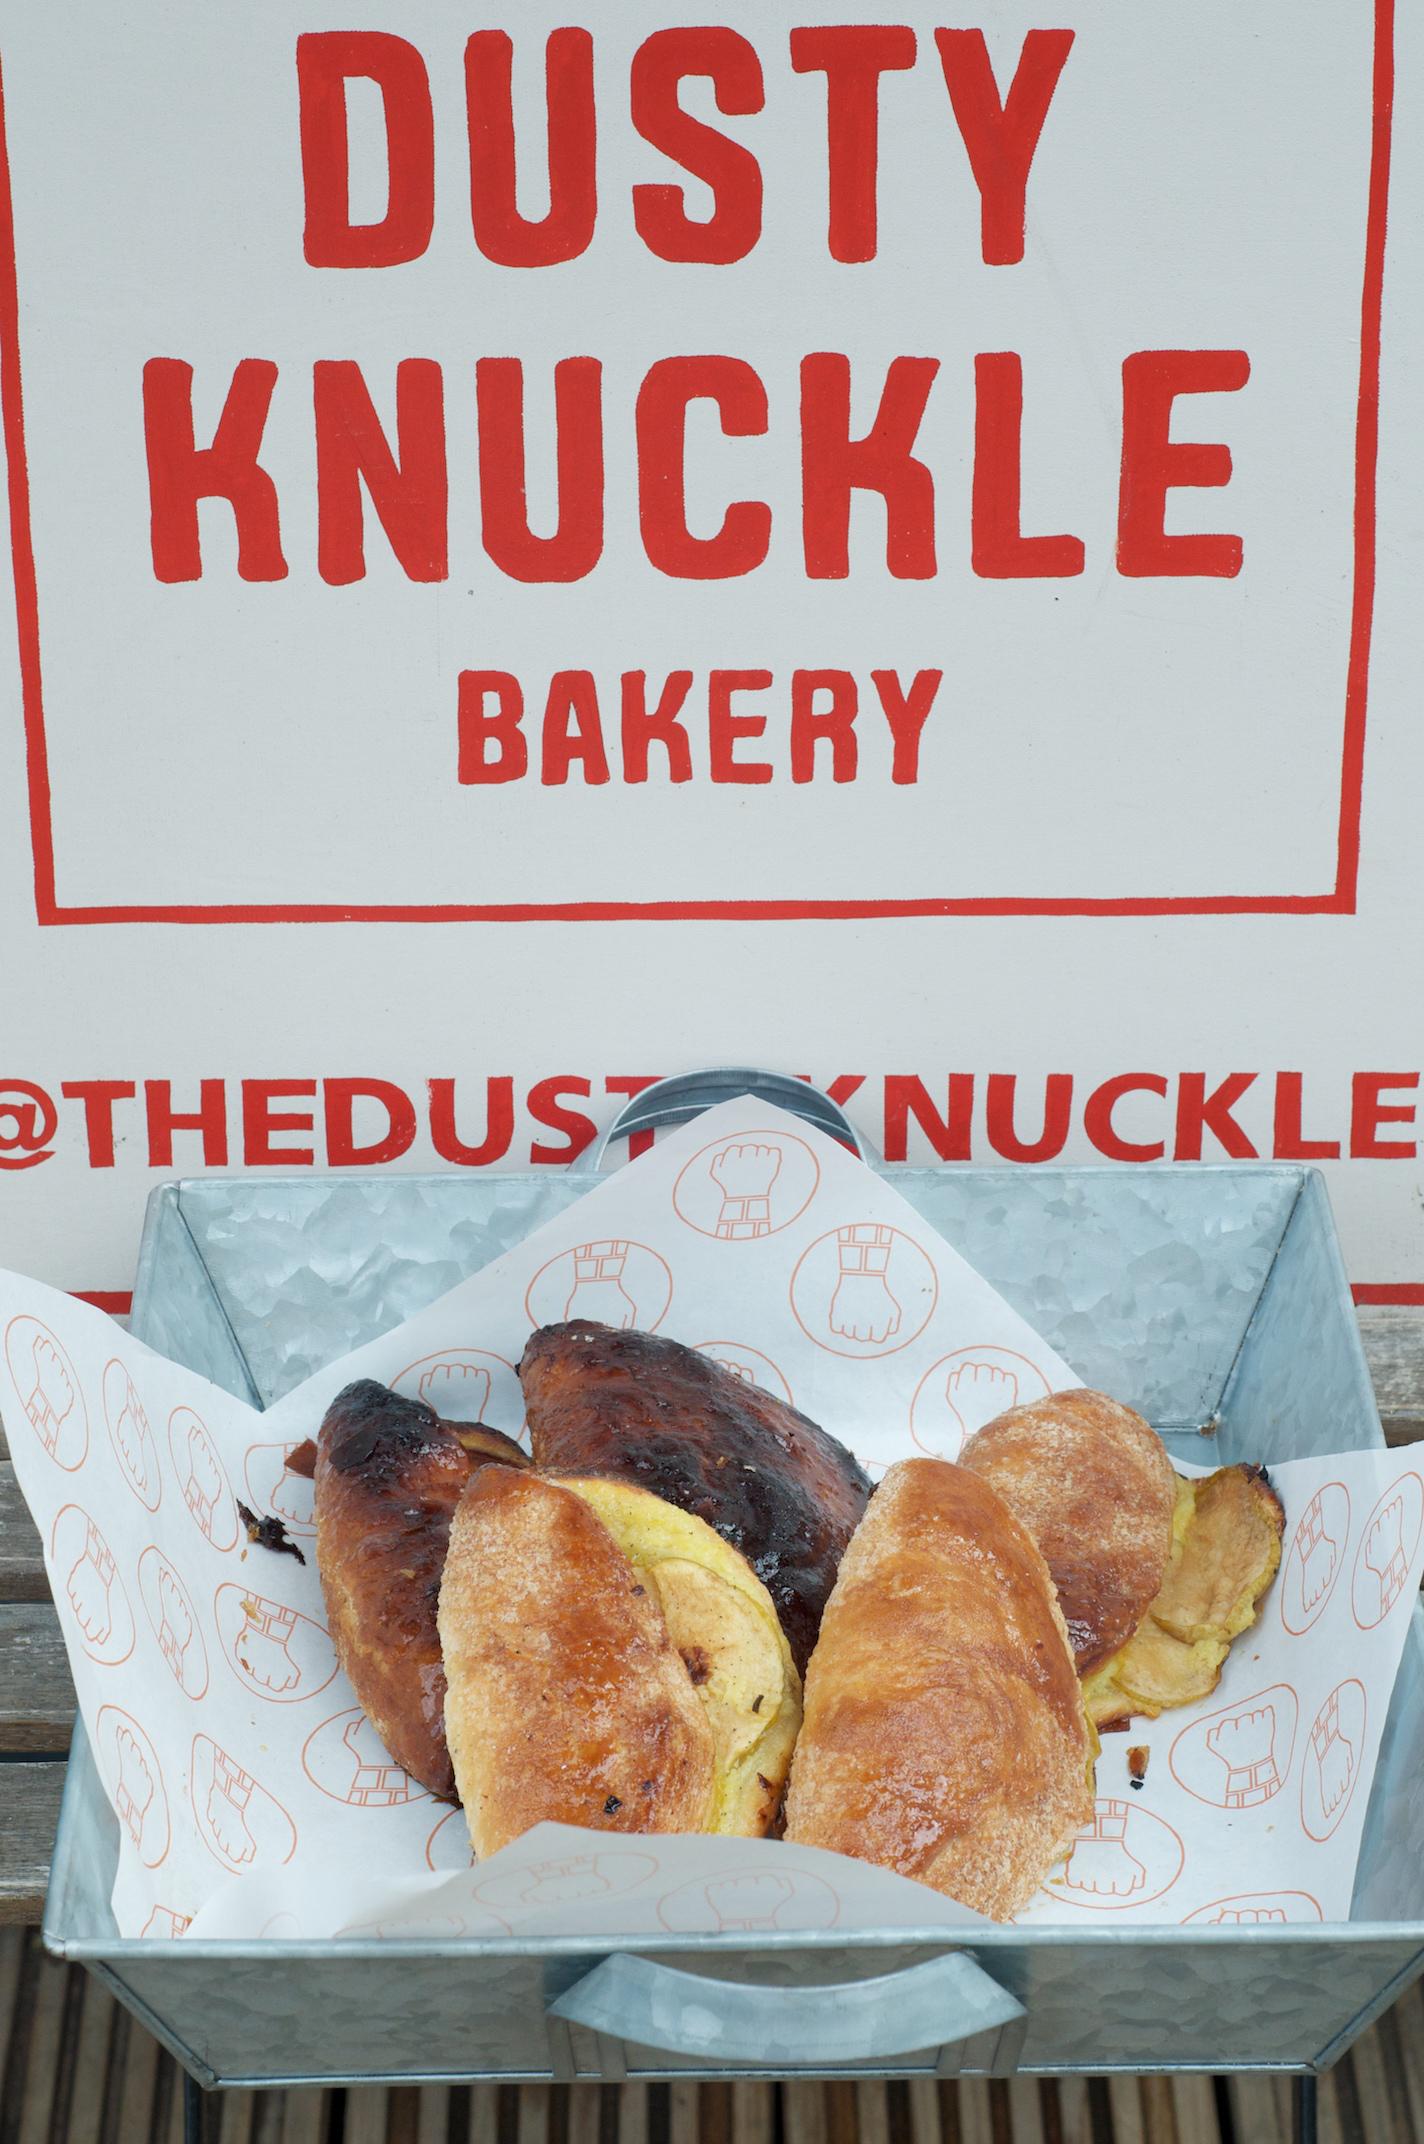 Dusty-Knuckle-sign.jpg